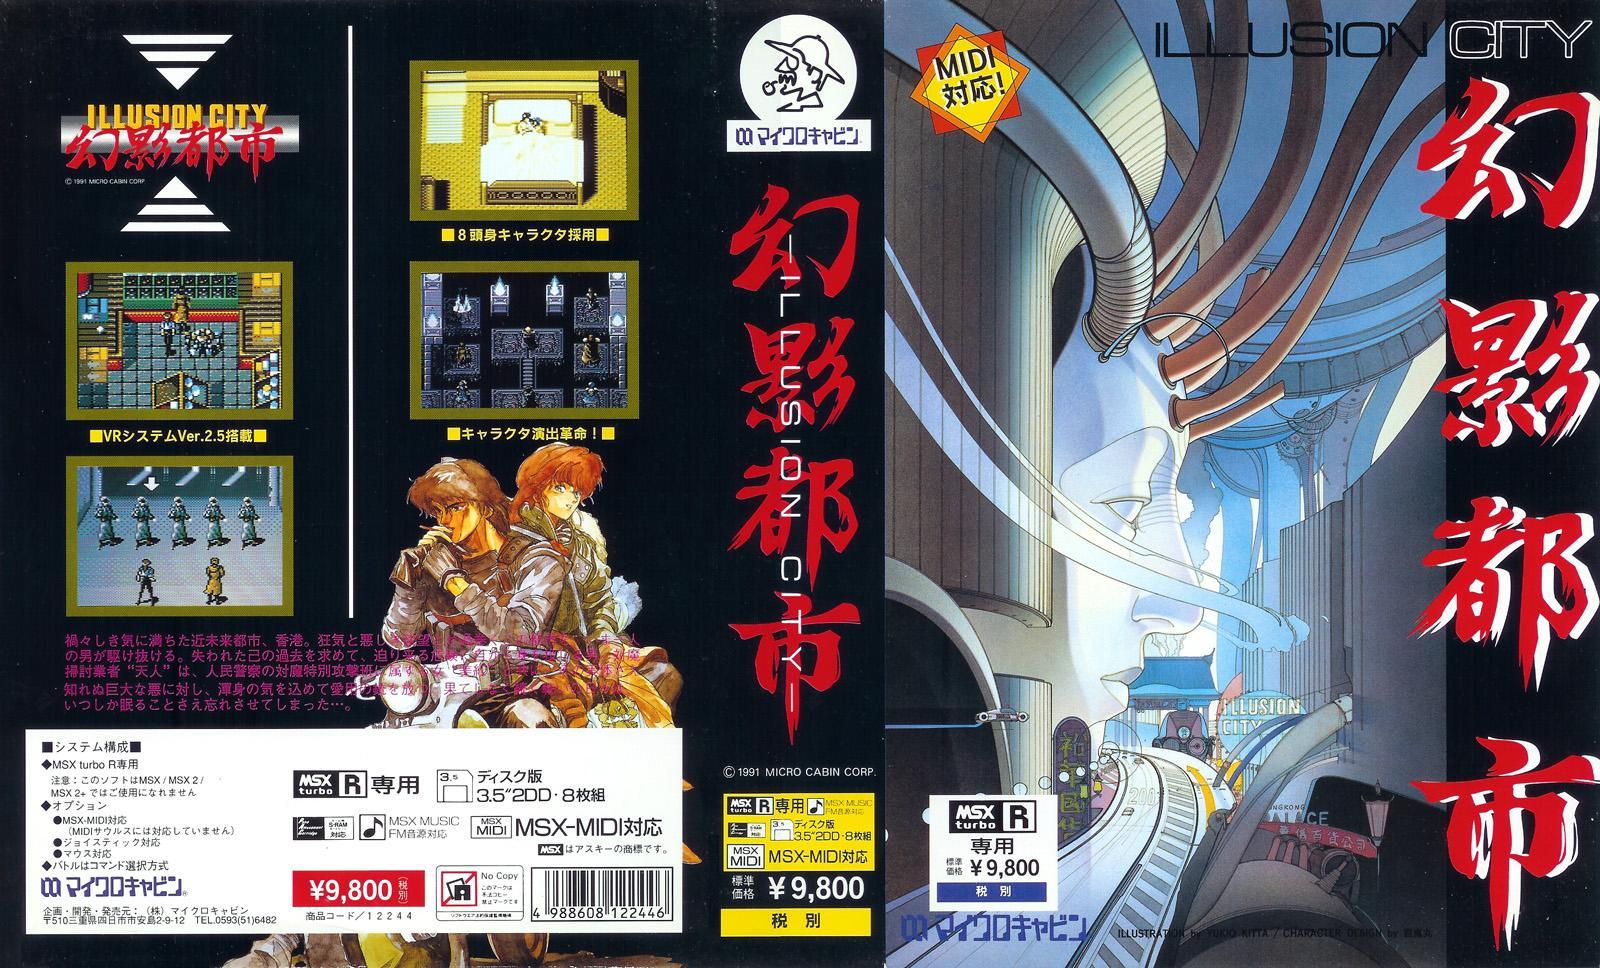 Illusion City HD wallpapers, Desktop wallpaper - most viewed